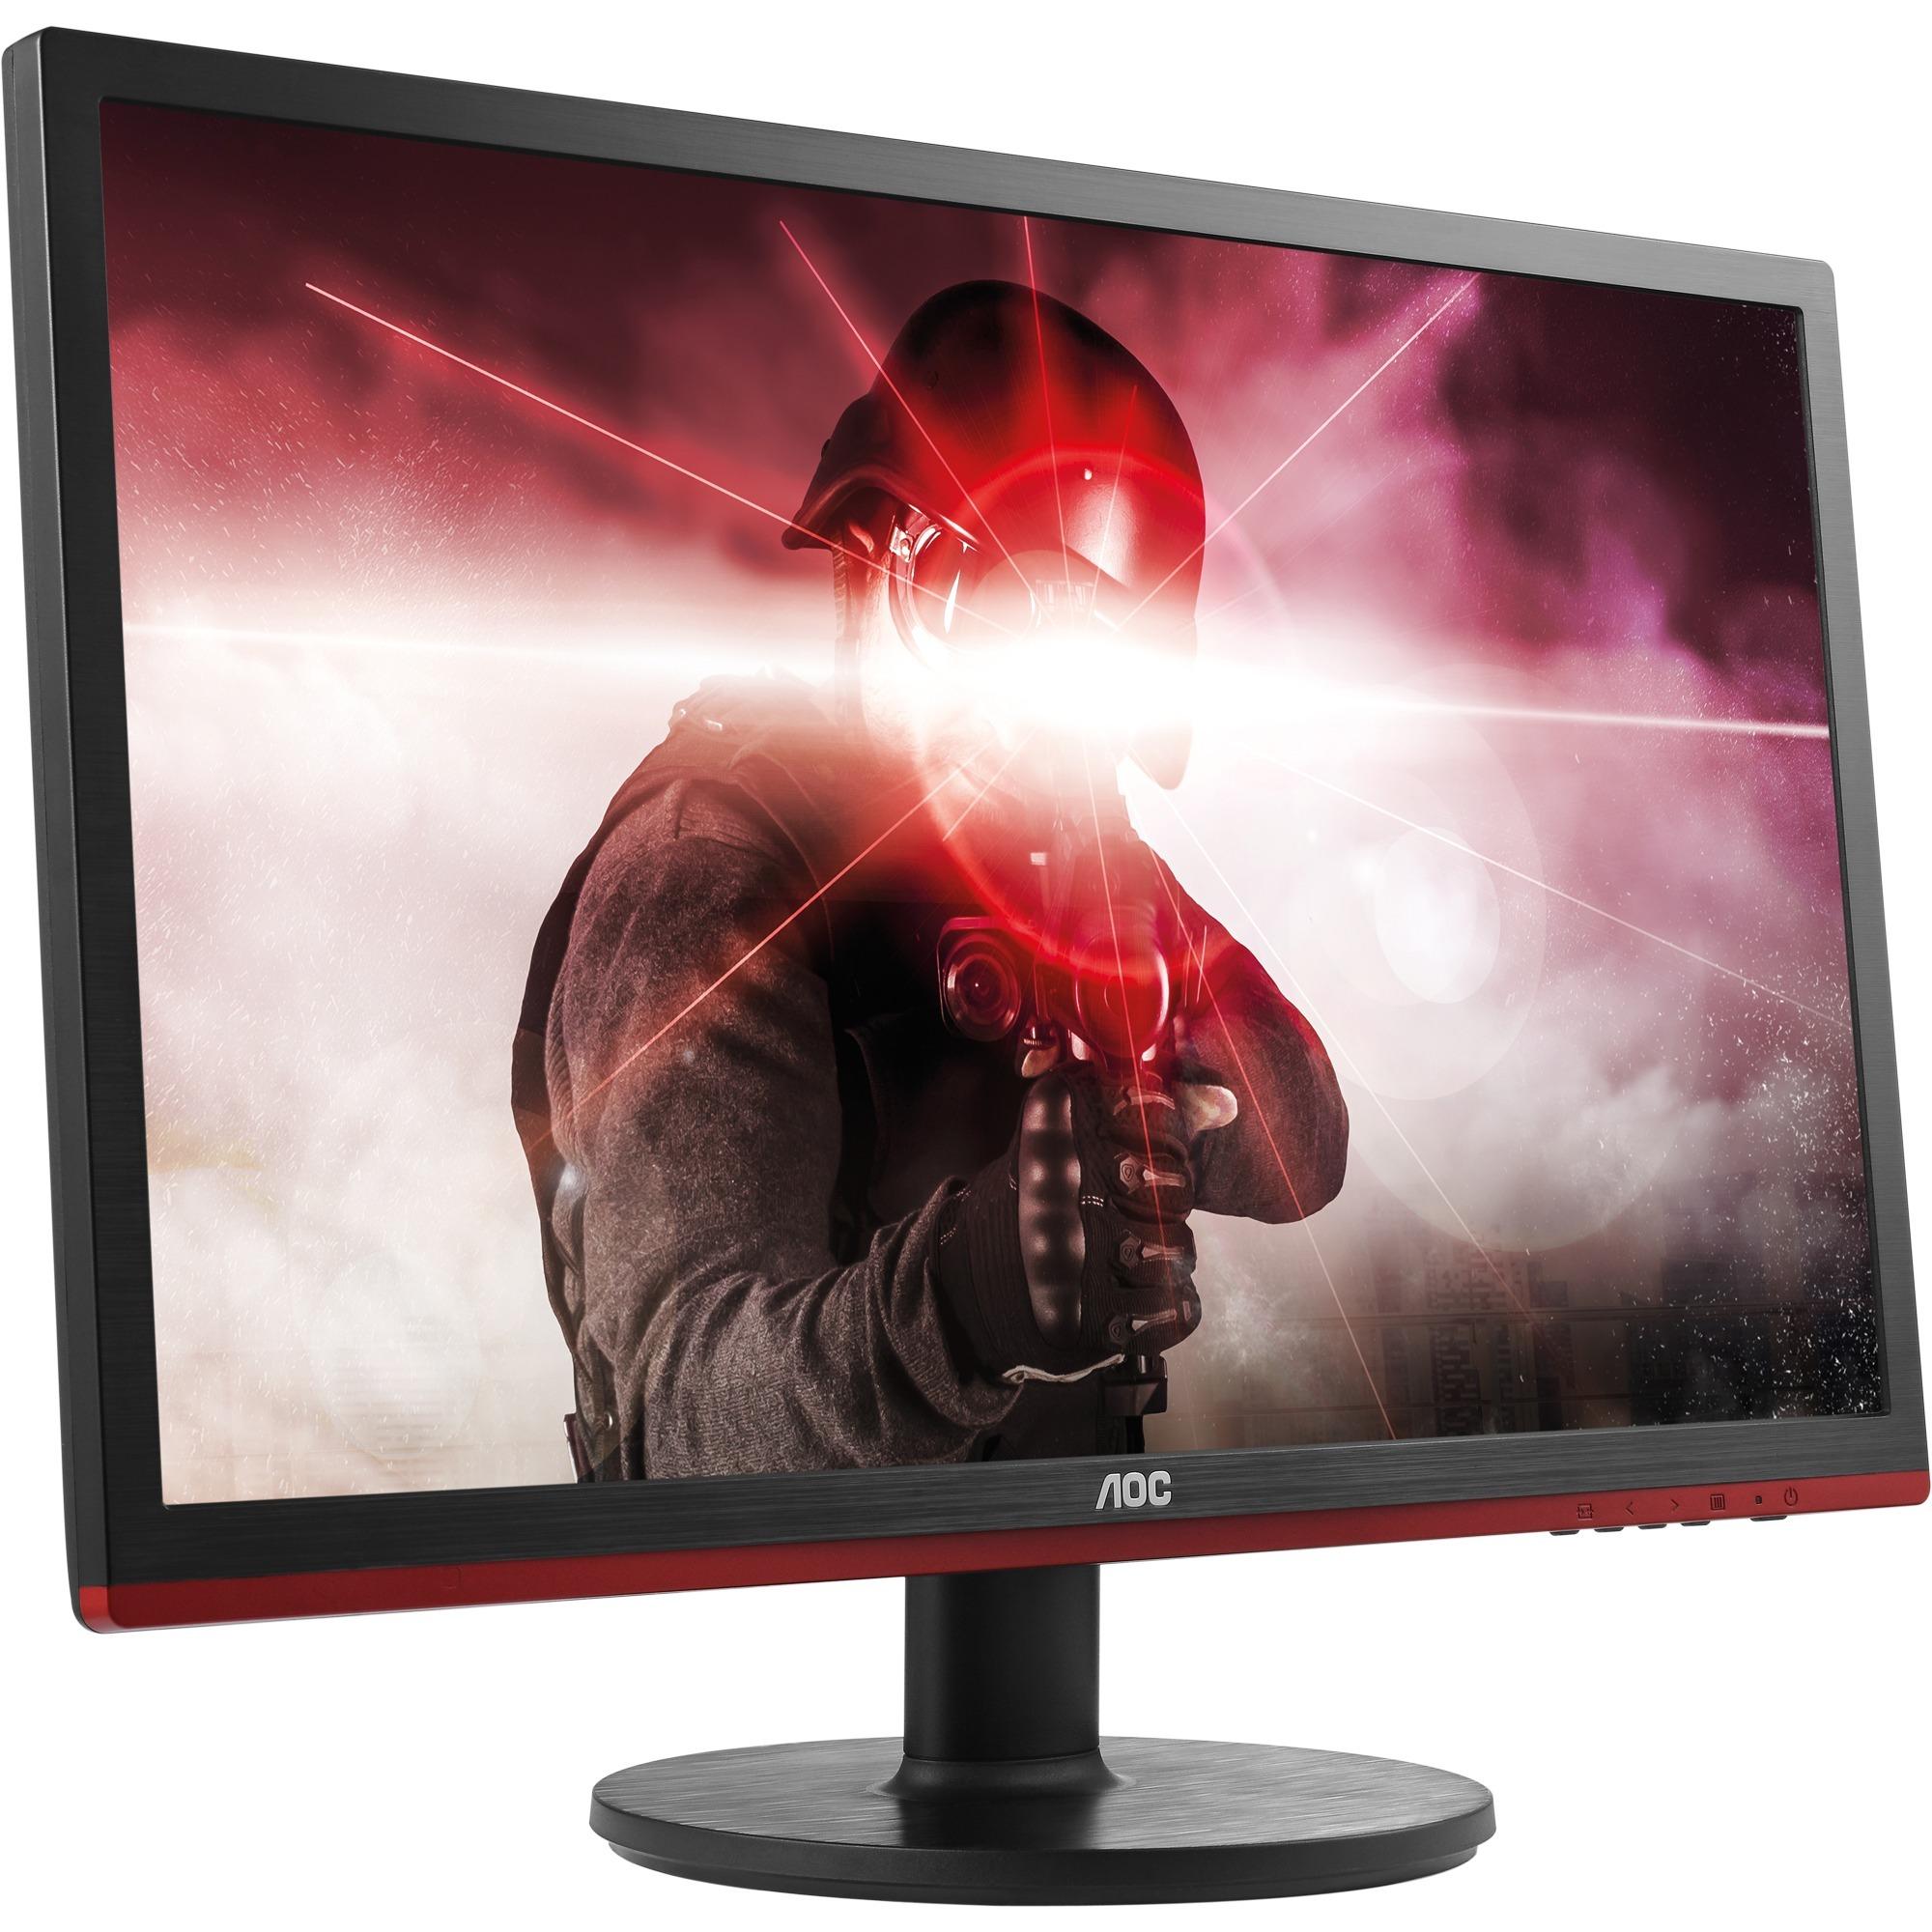 "Gaming G2460VQ6 LED display 61 cm (24"") Full HD Negro, Monitor LED"